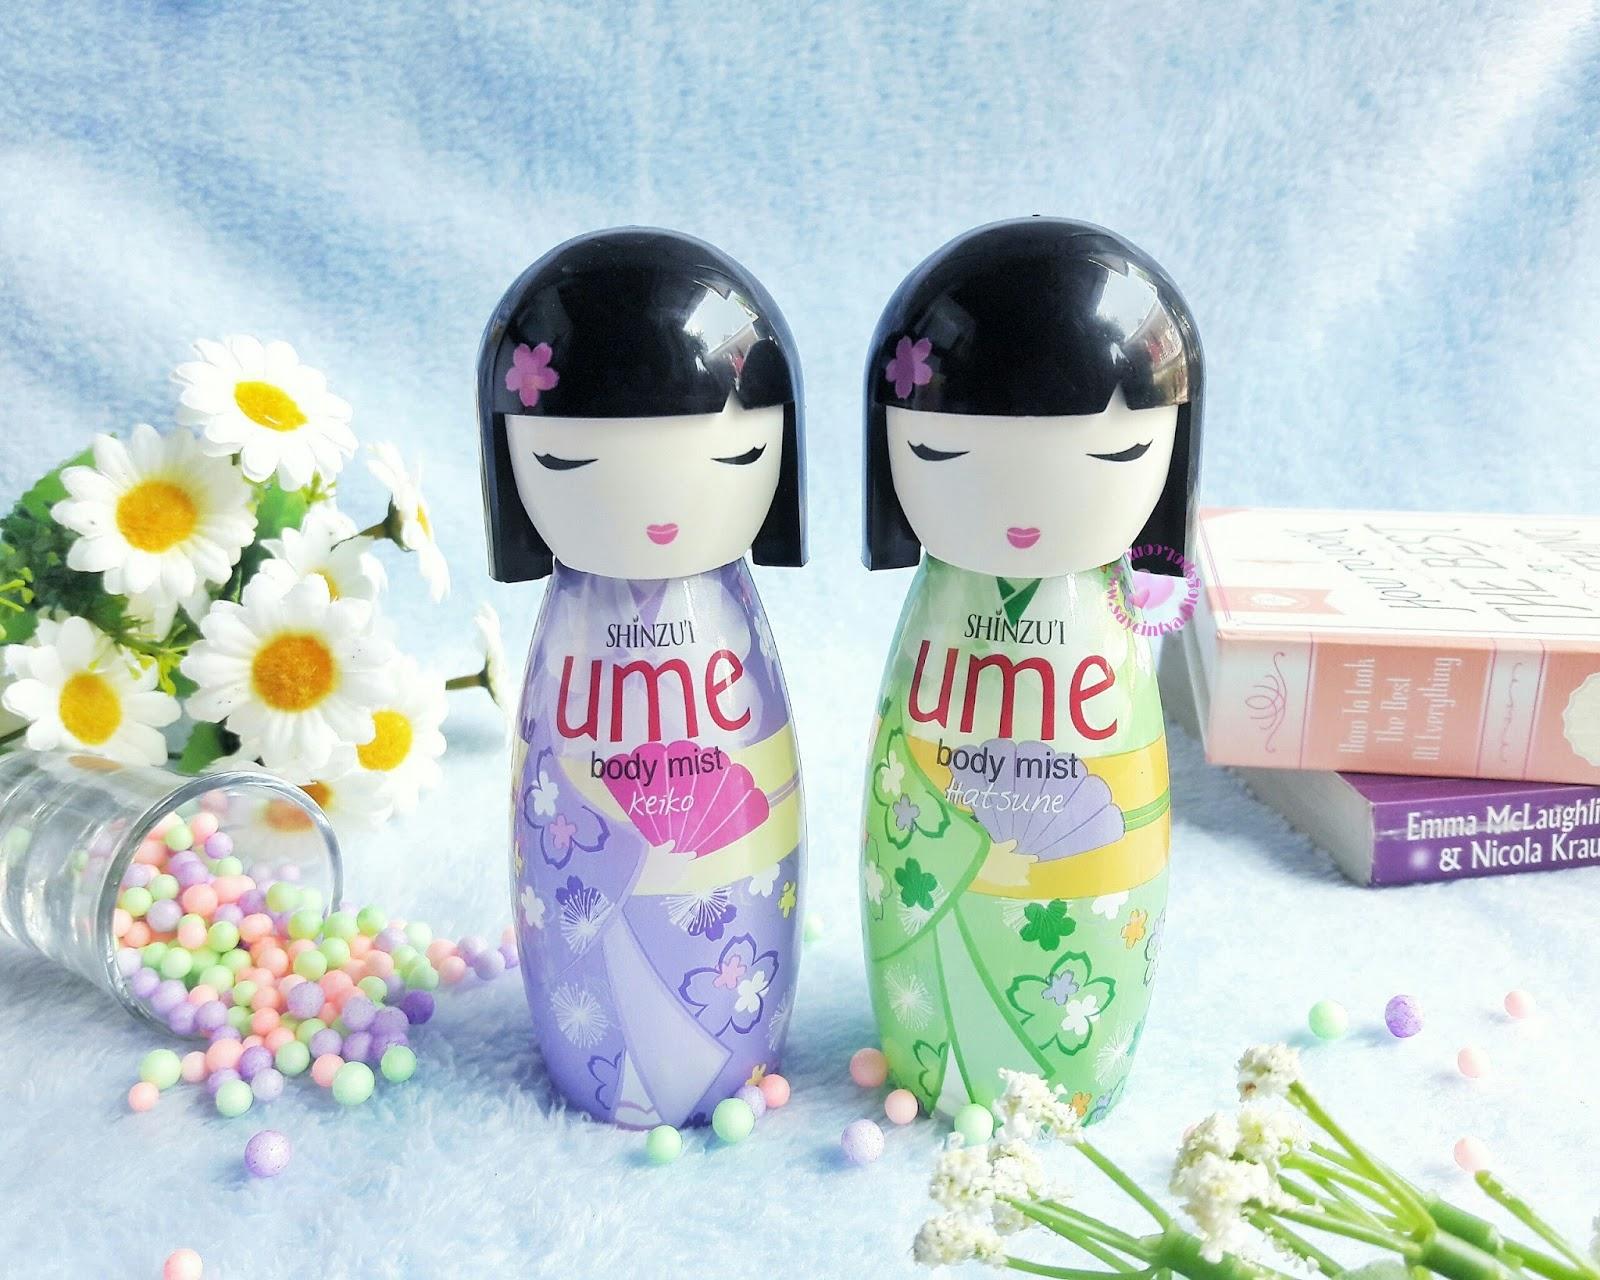 Cintyas Beauty Blog Indonesian Blogger Review Shinzui Ume Body Mist Keiko Hatsune